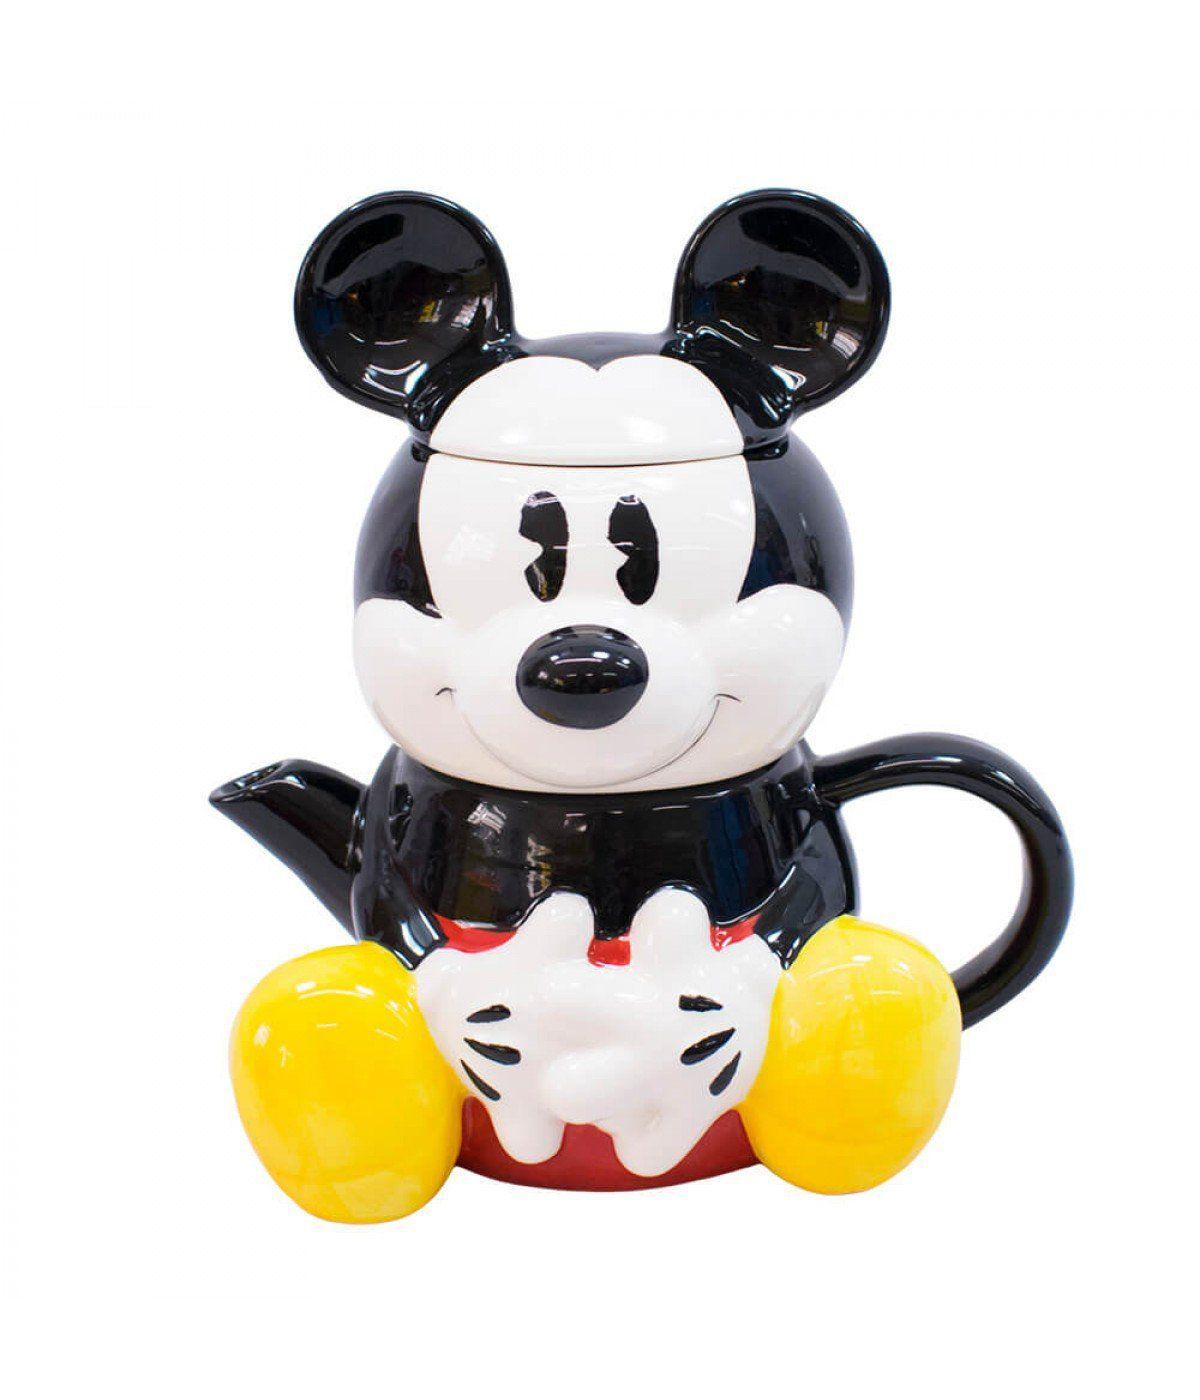 Jogo de Bule e Caneca Mickey Mouse: Mickey e Minnie Mouse - Disney 720ml